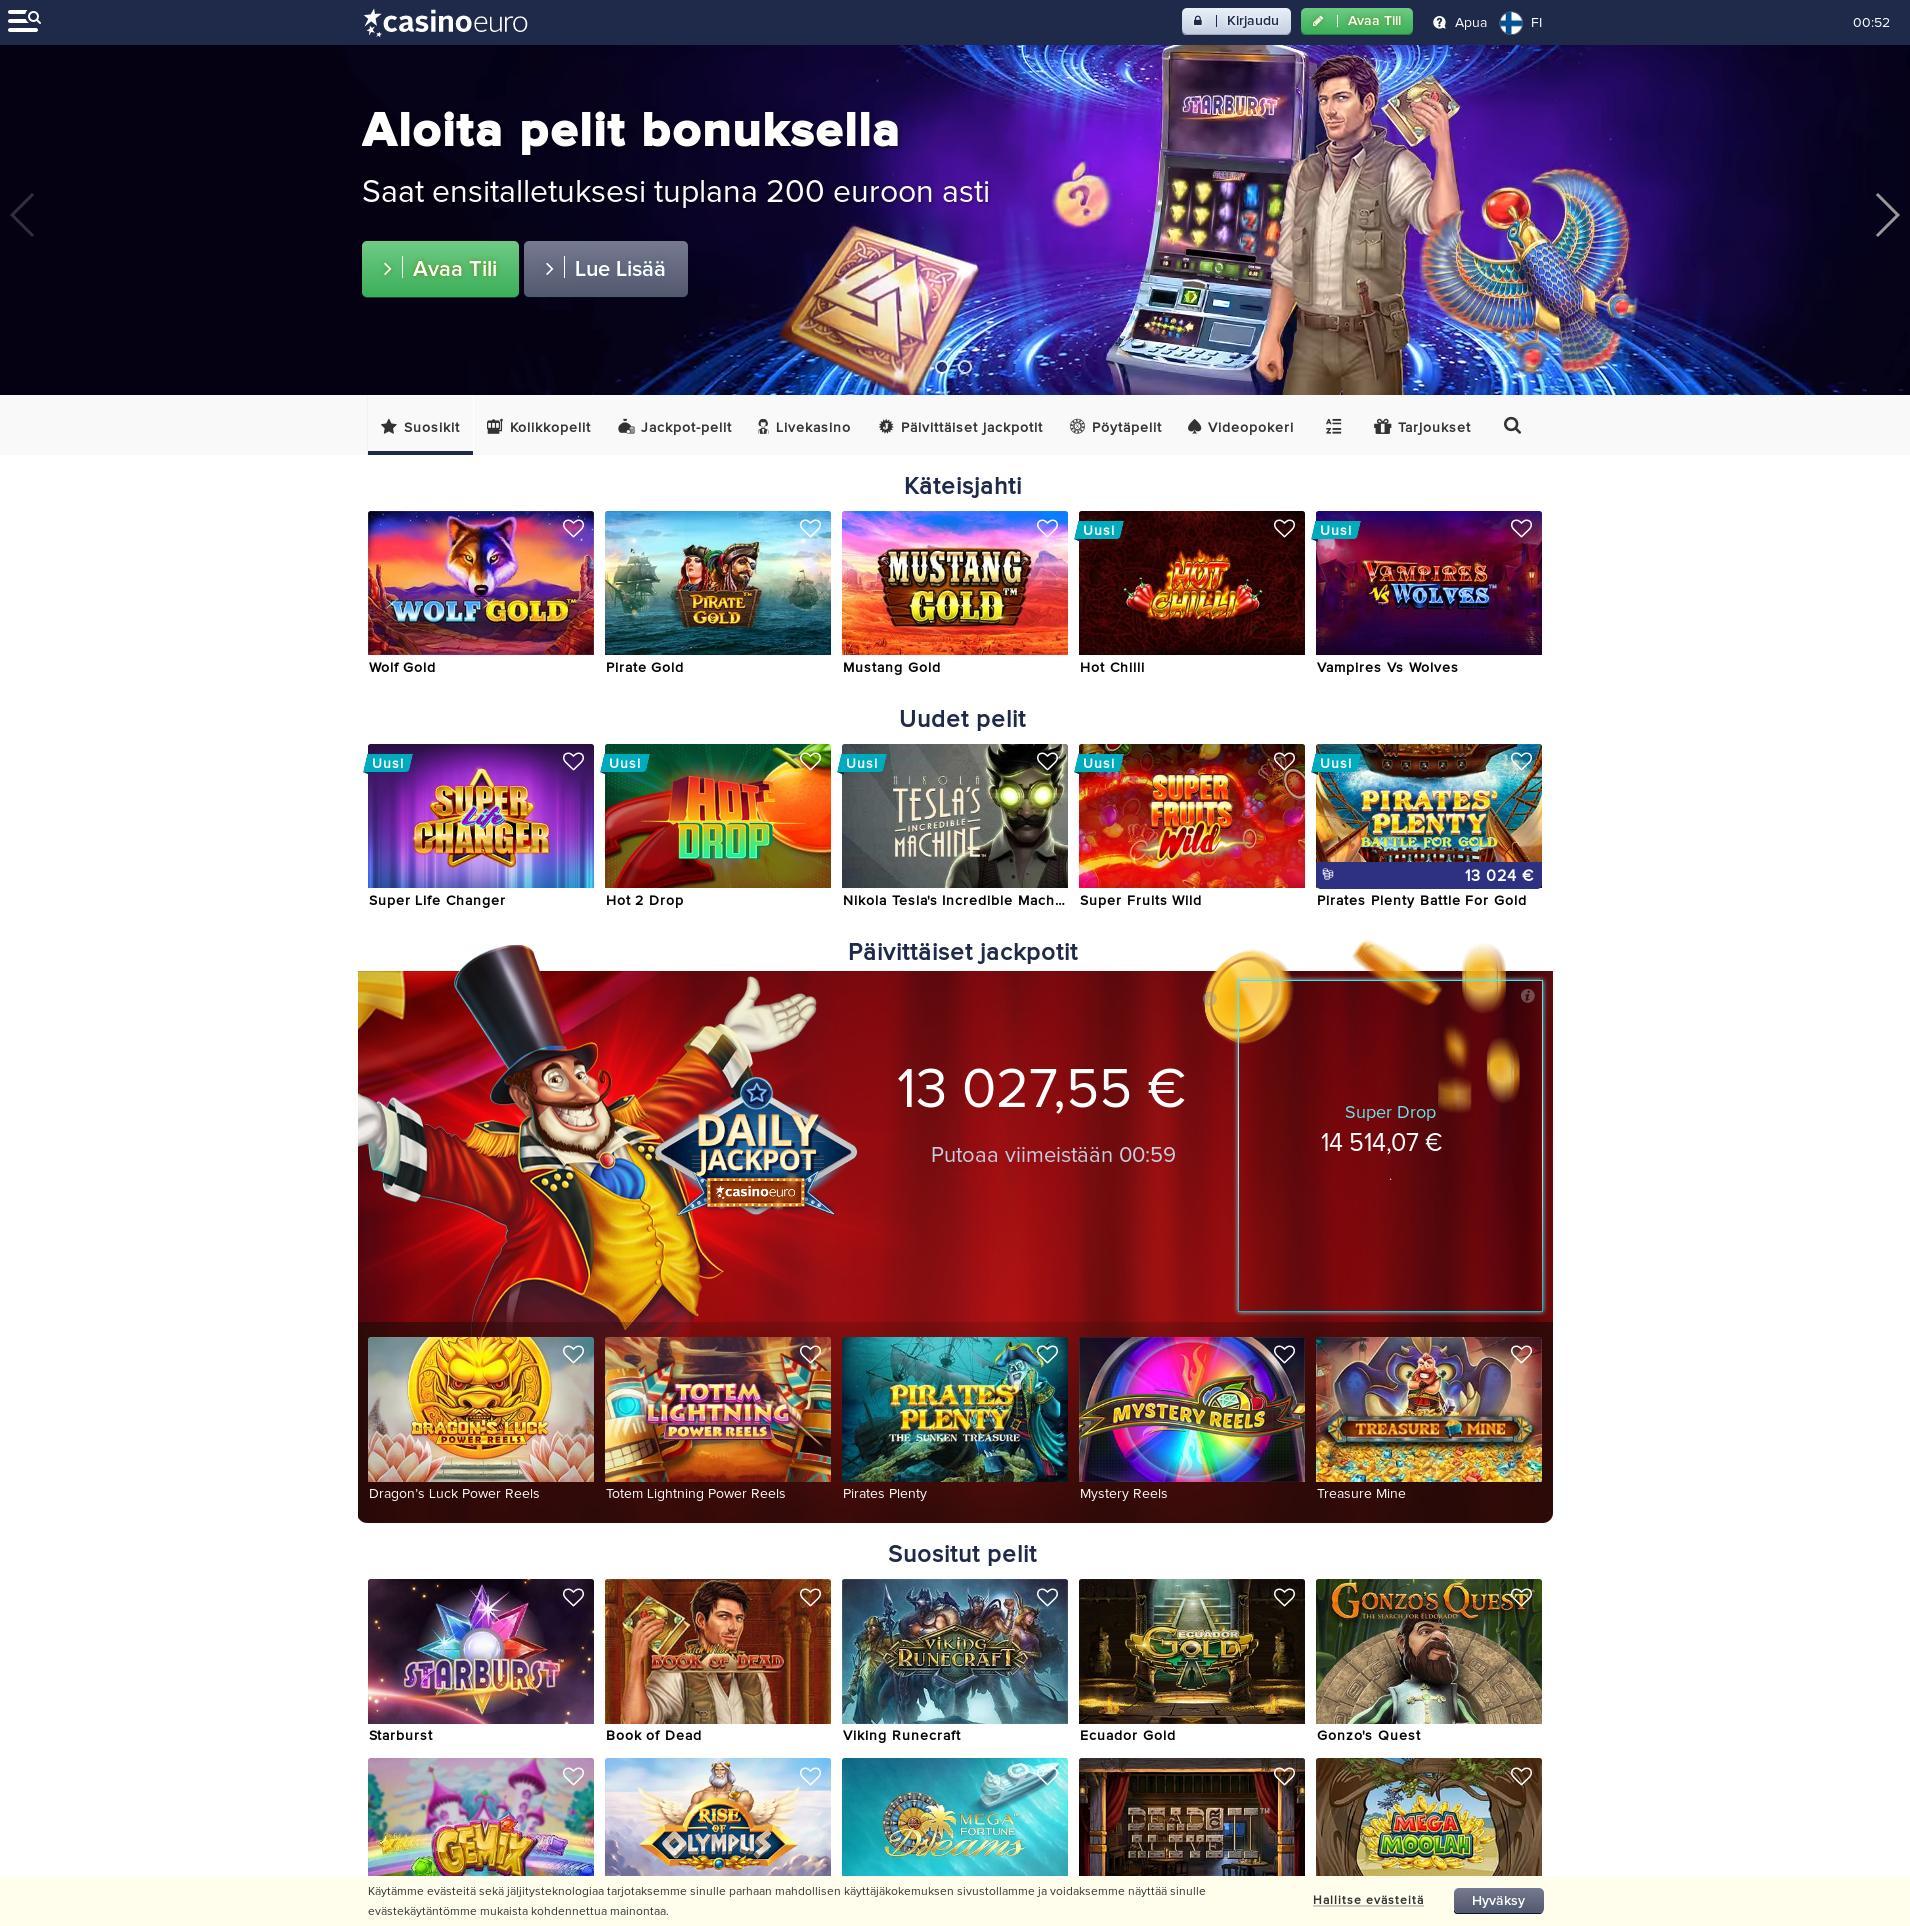 Casino screen Lobby 2019-09-16 for Finland